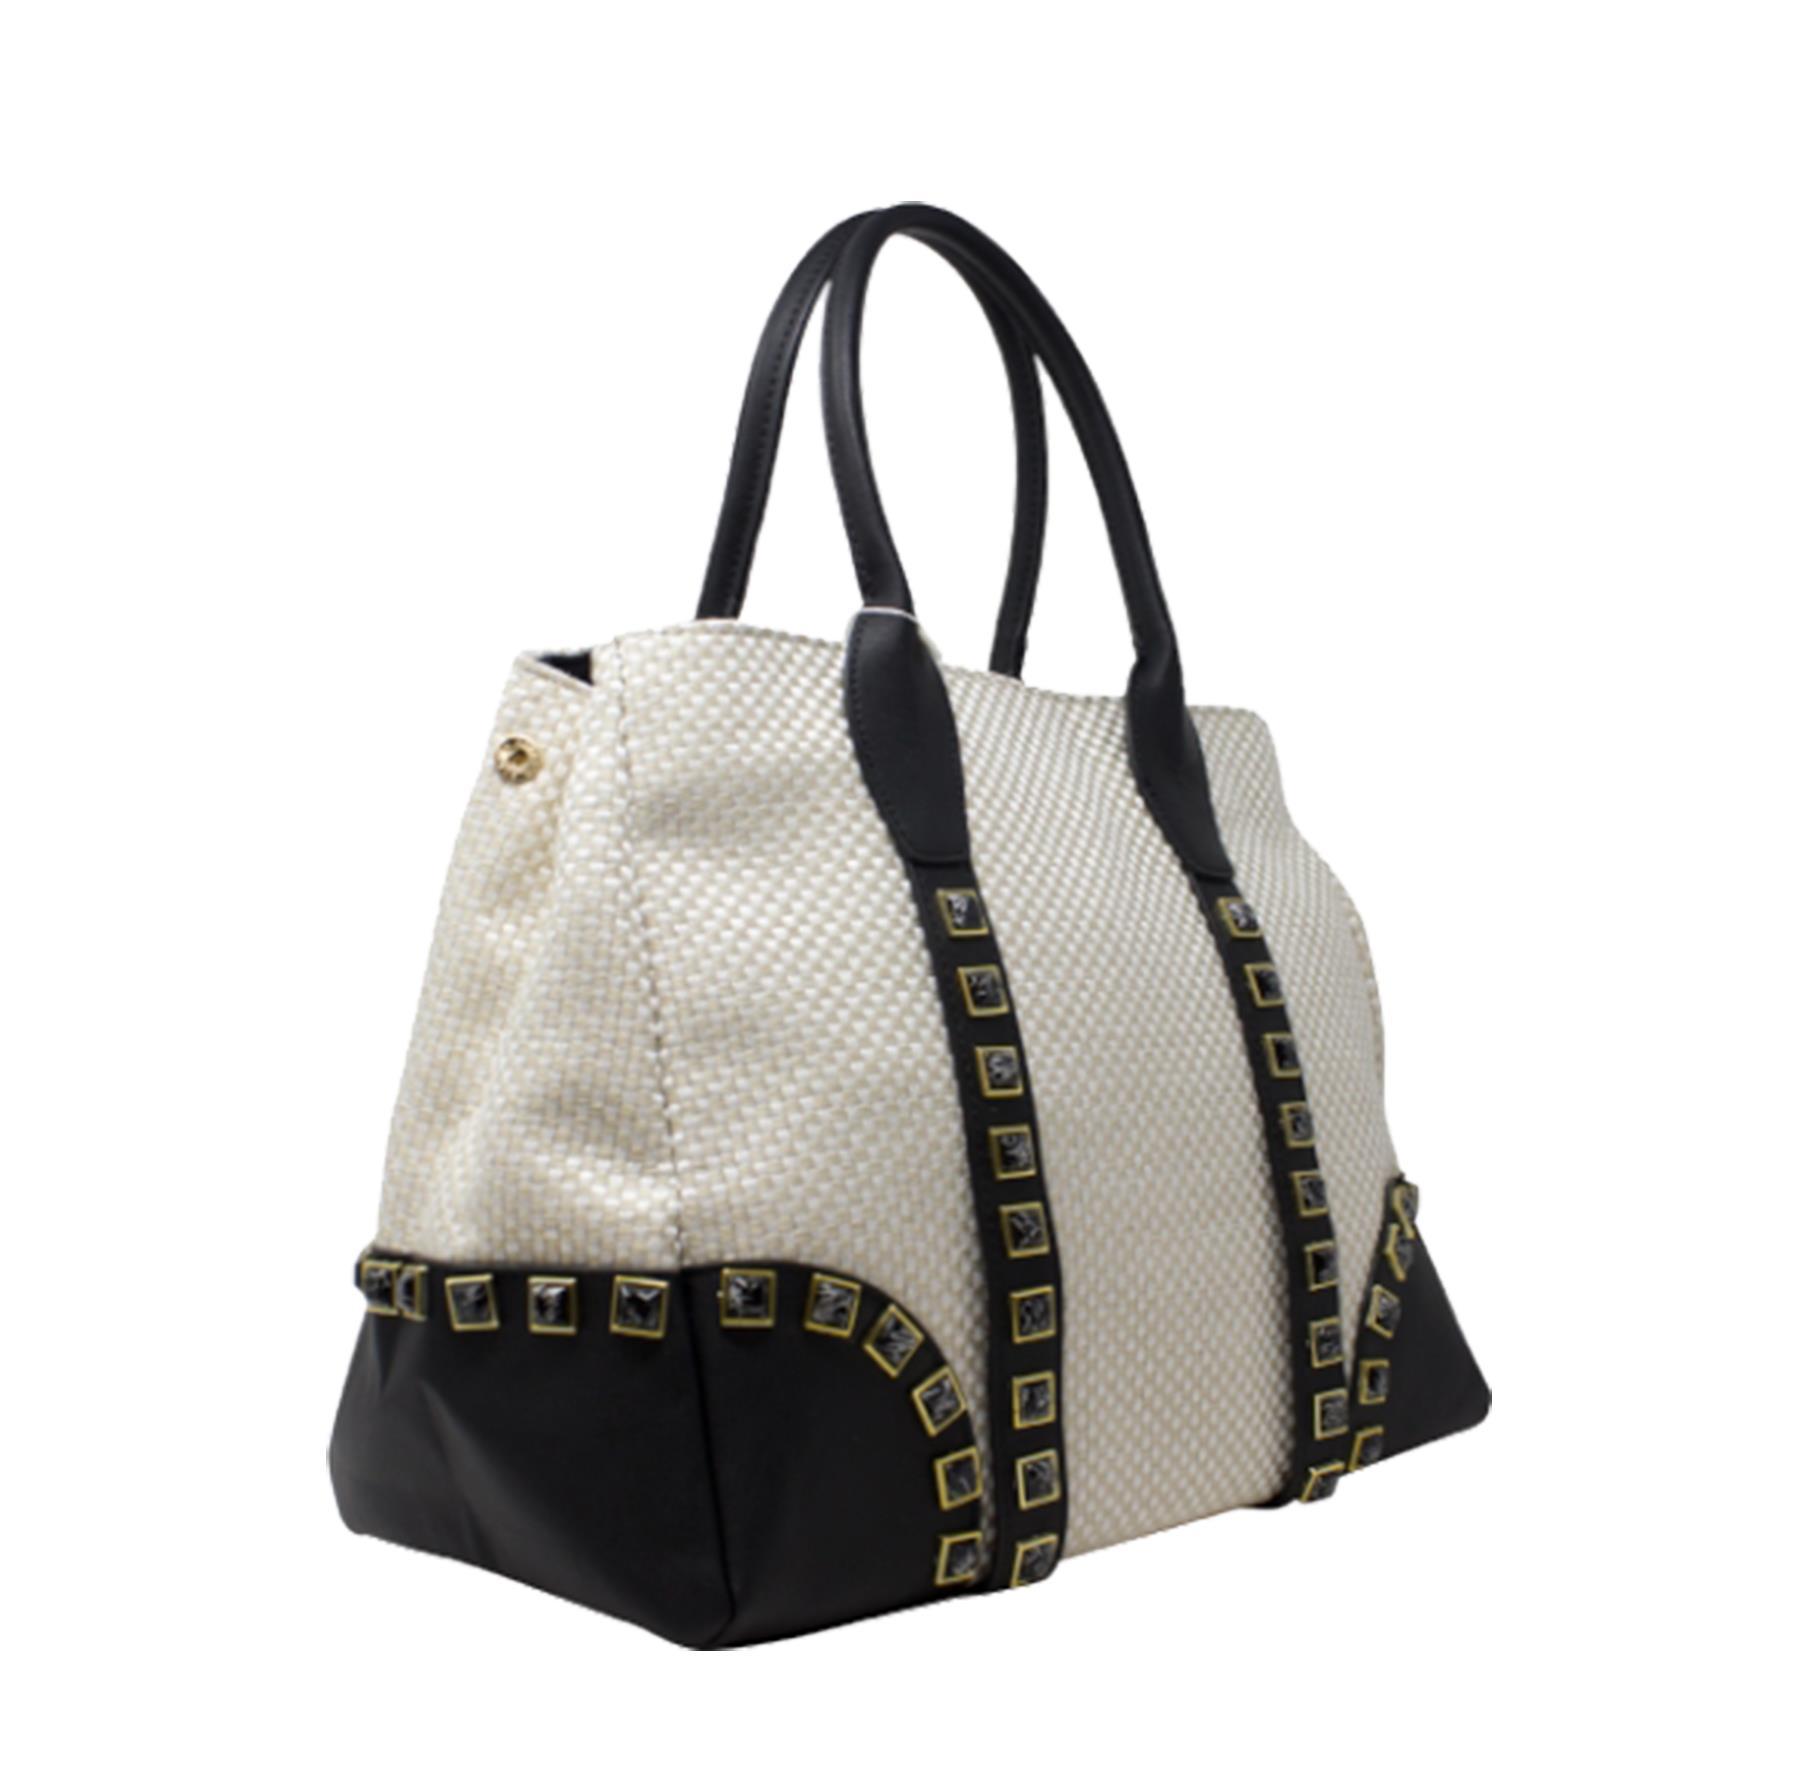 New-Women-s-Small-Check-Pattern-Studded-Design-Tote-Bag-Handbag thumbnail 3